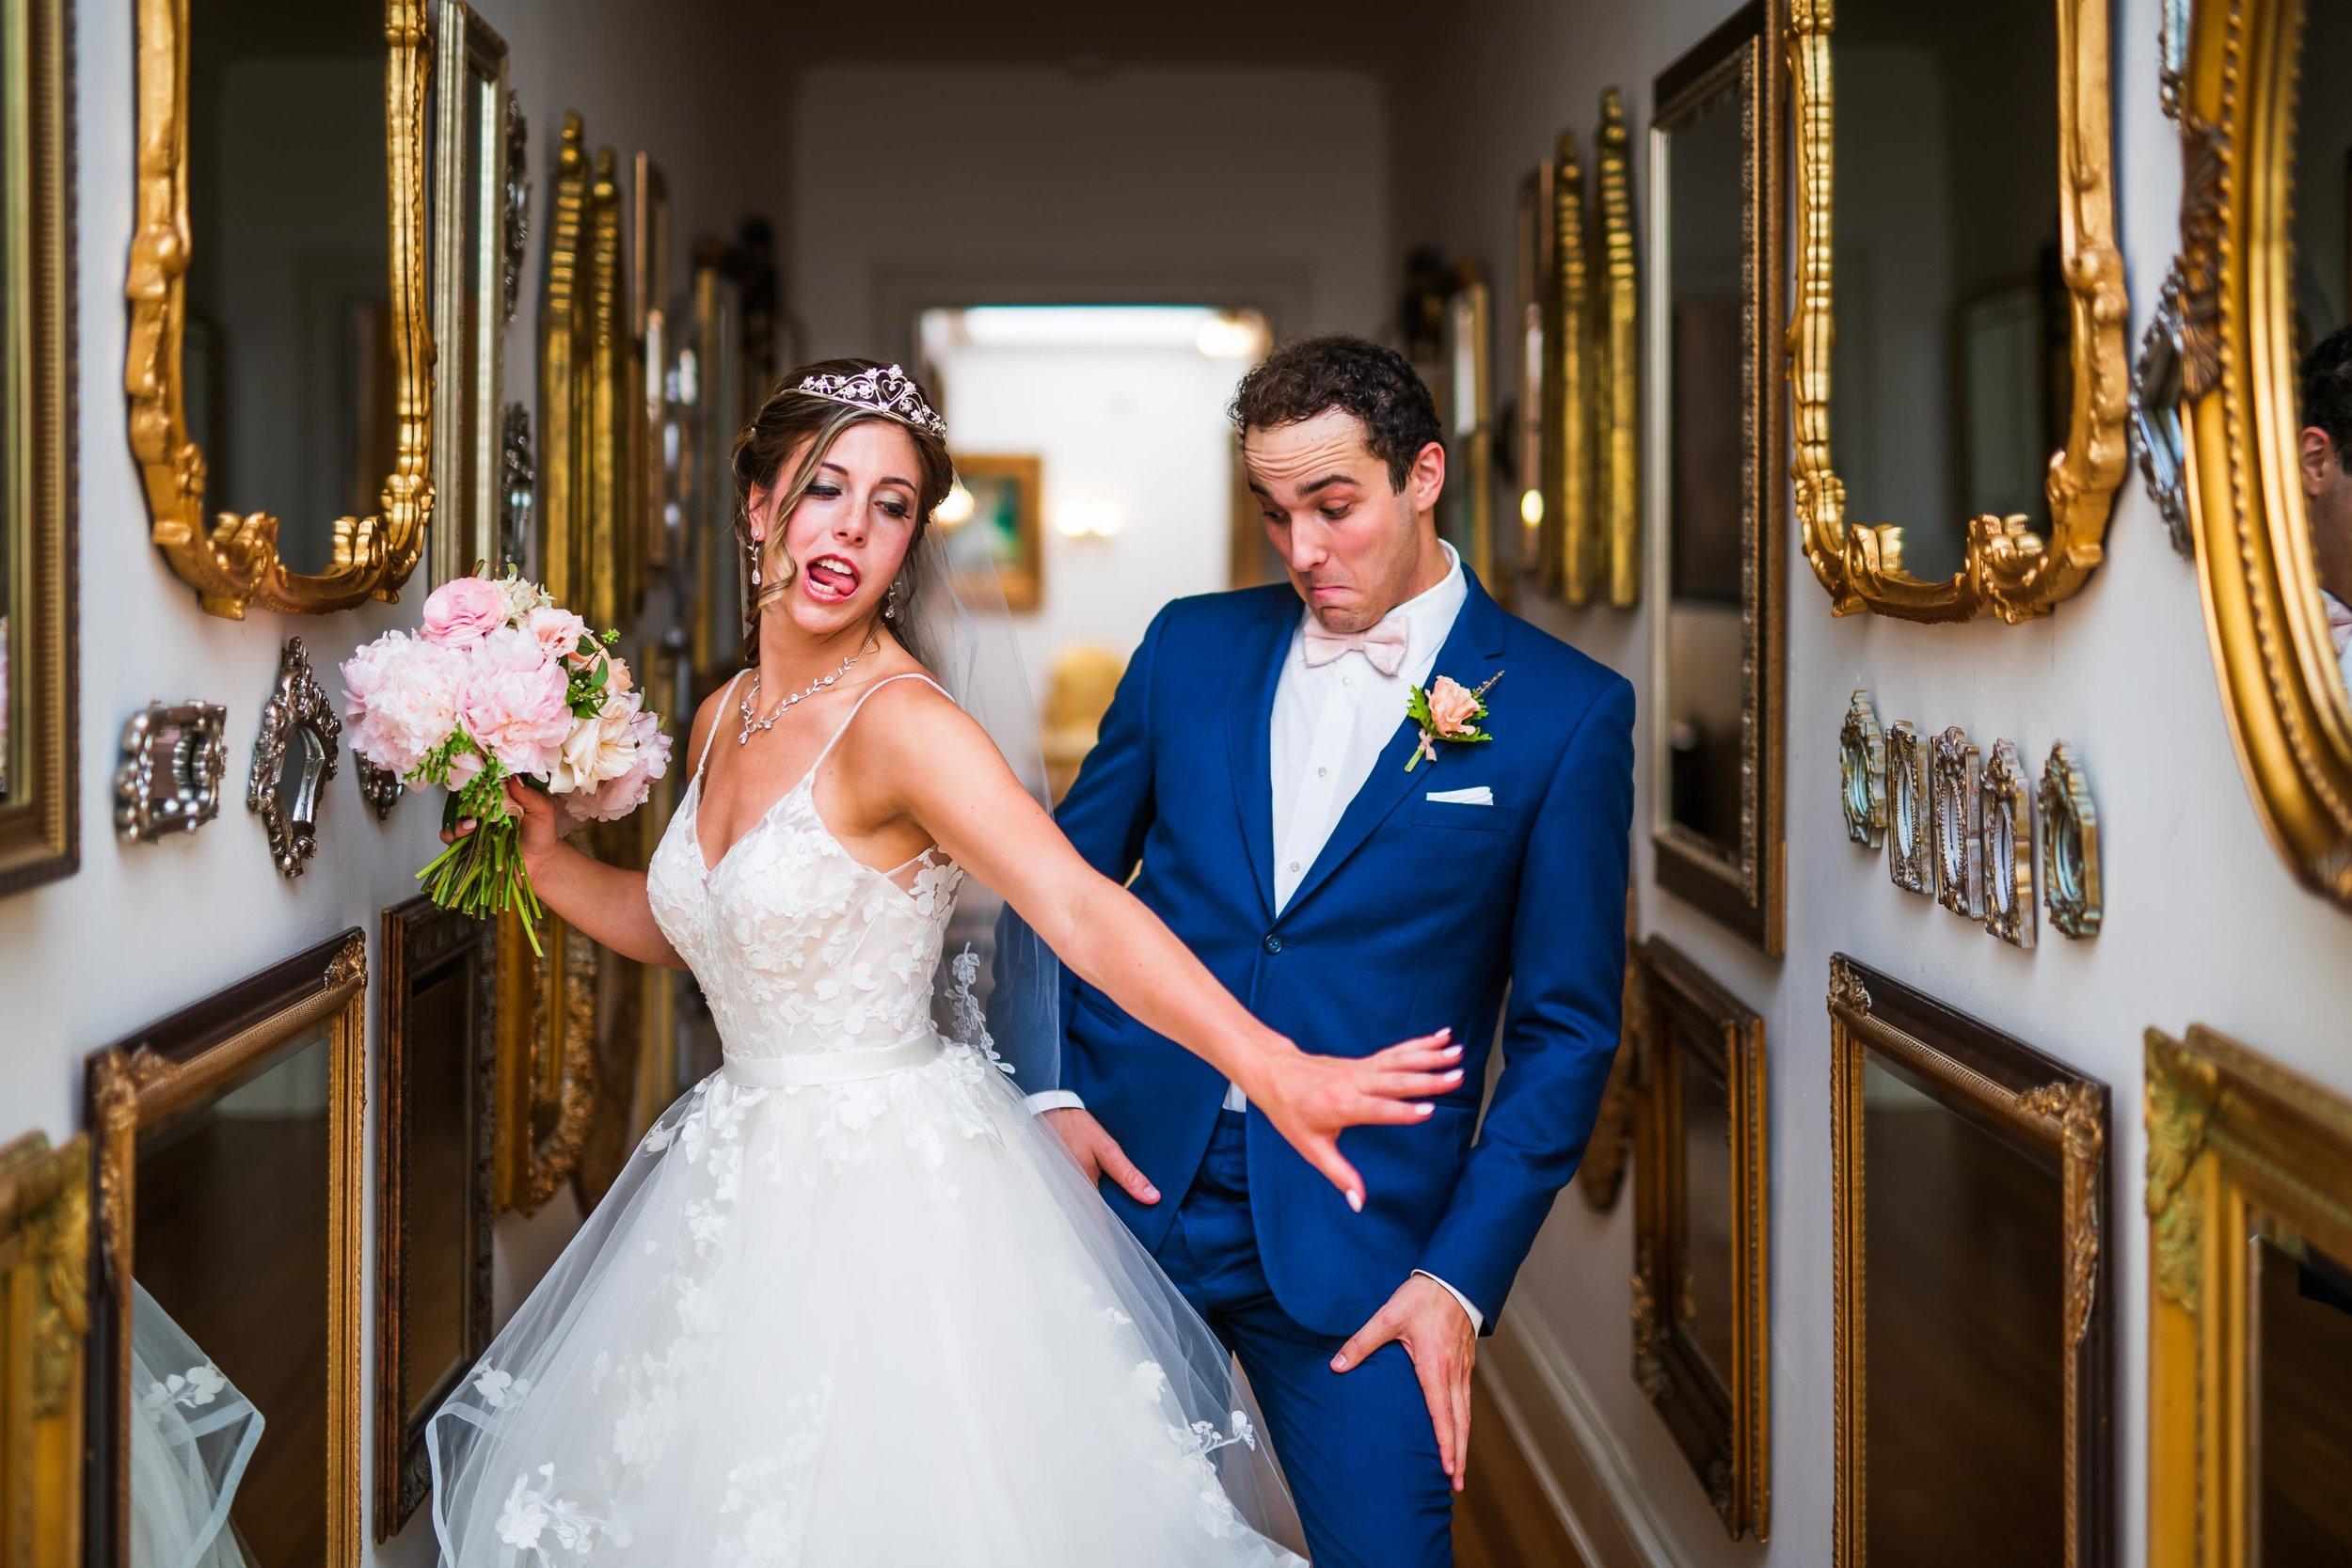 thornewood castle wedding 37.jpg